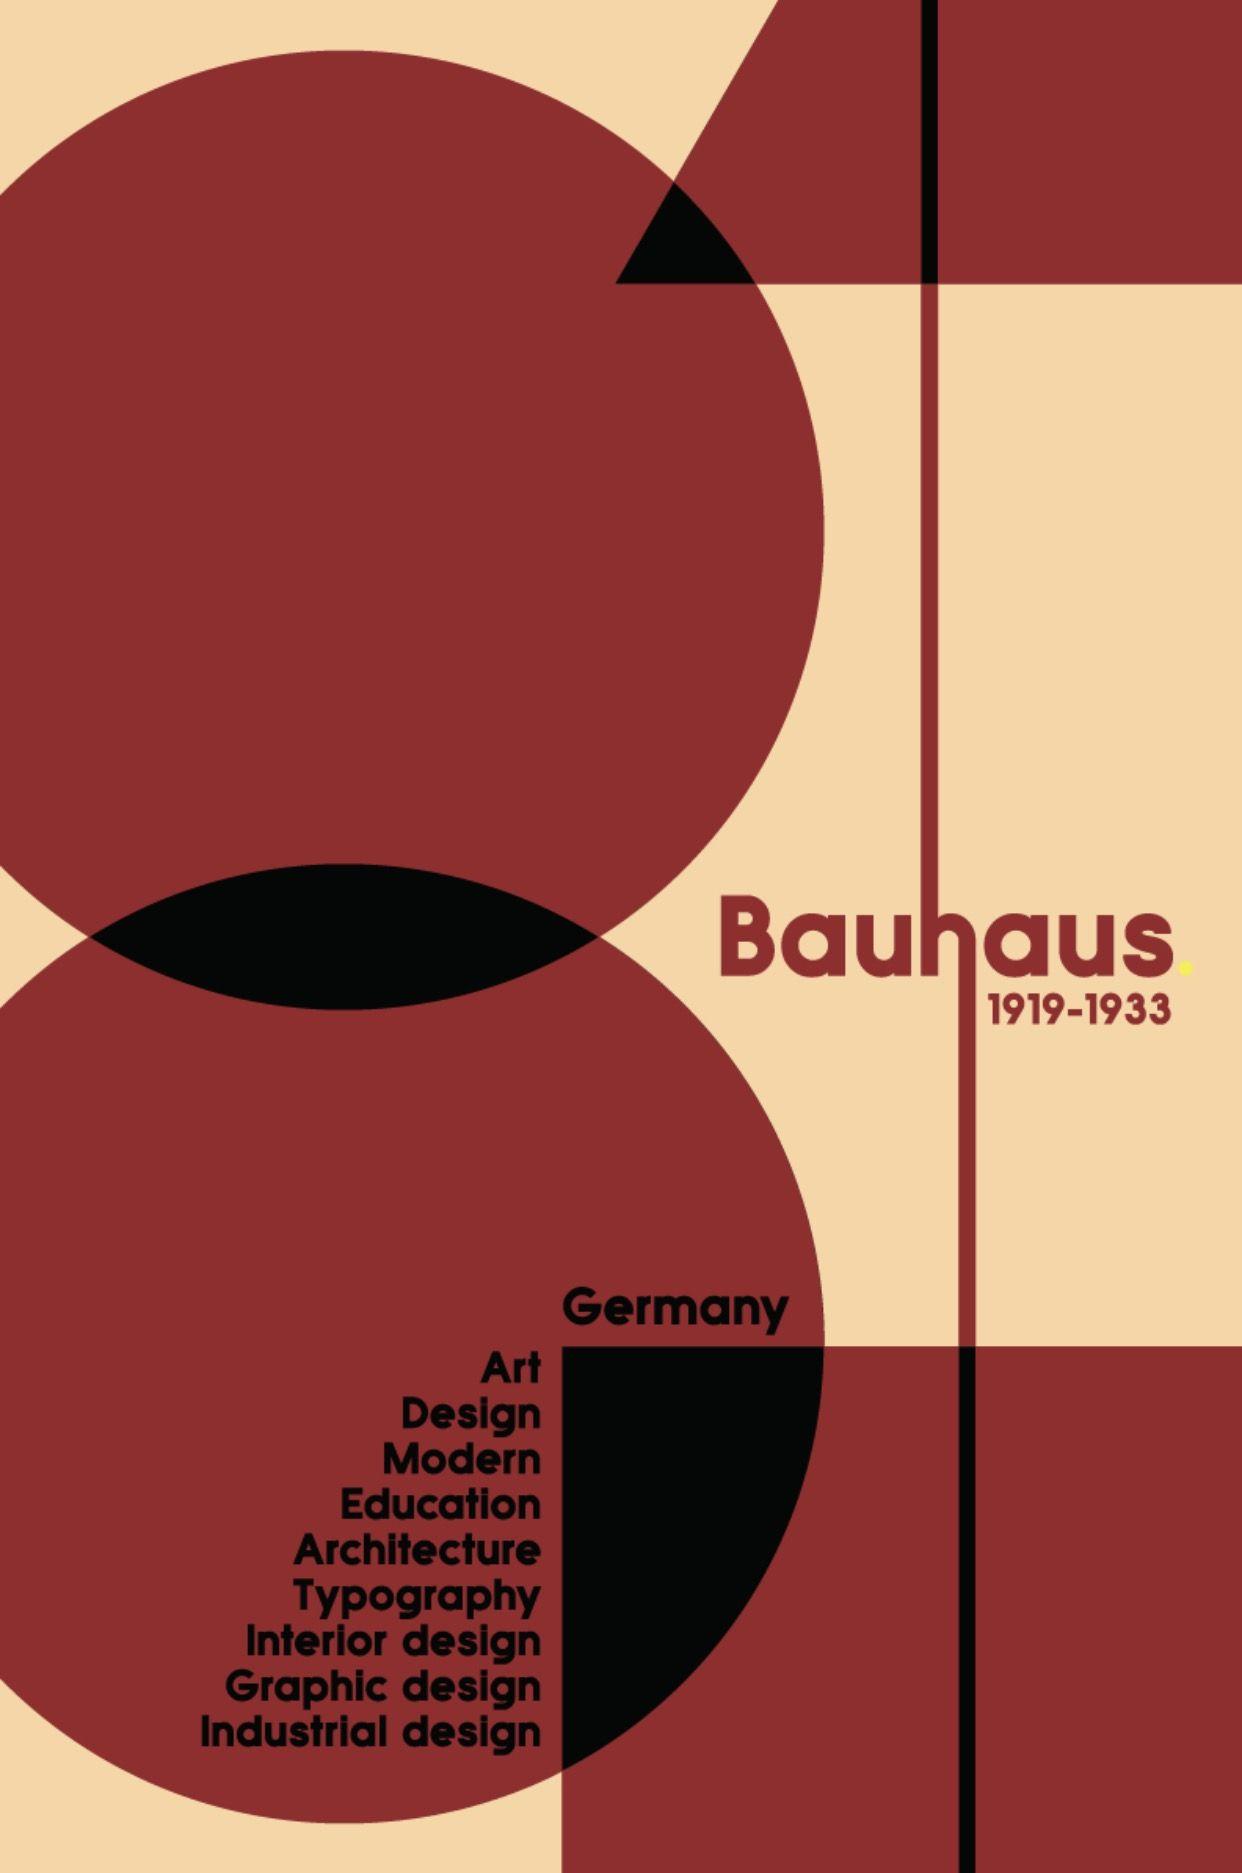 Bauhaus Poster Illustration C Anthony Rivera With Images